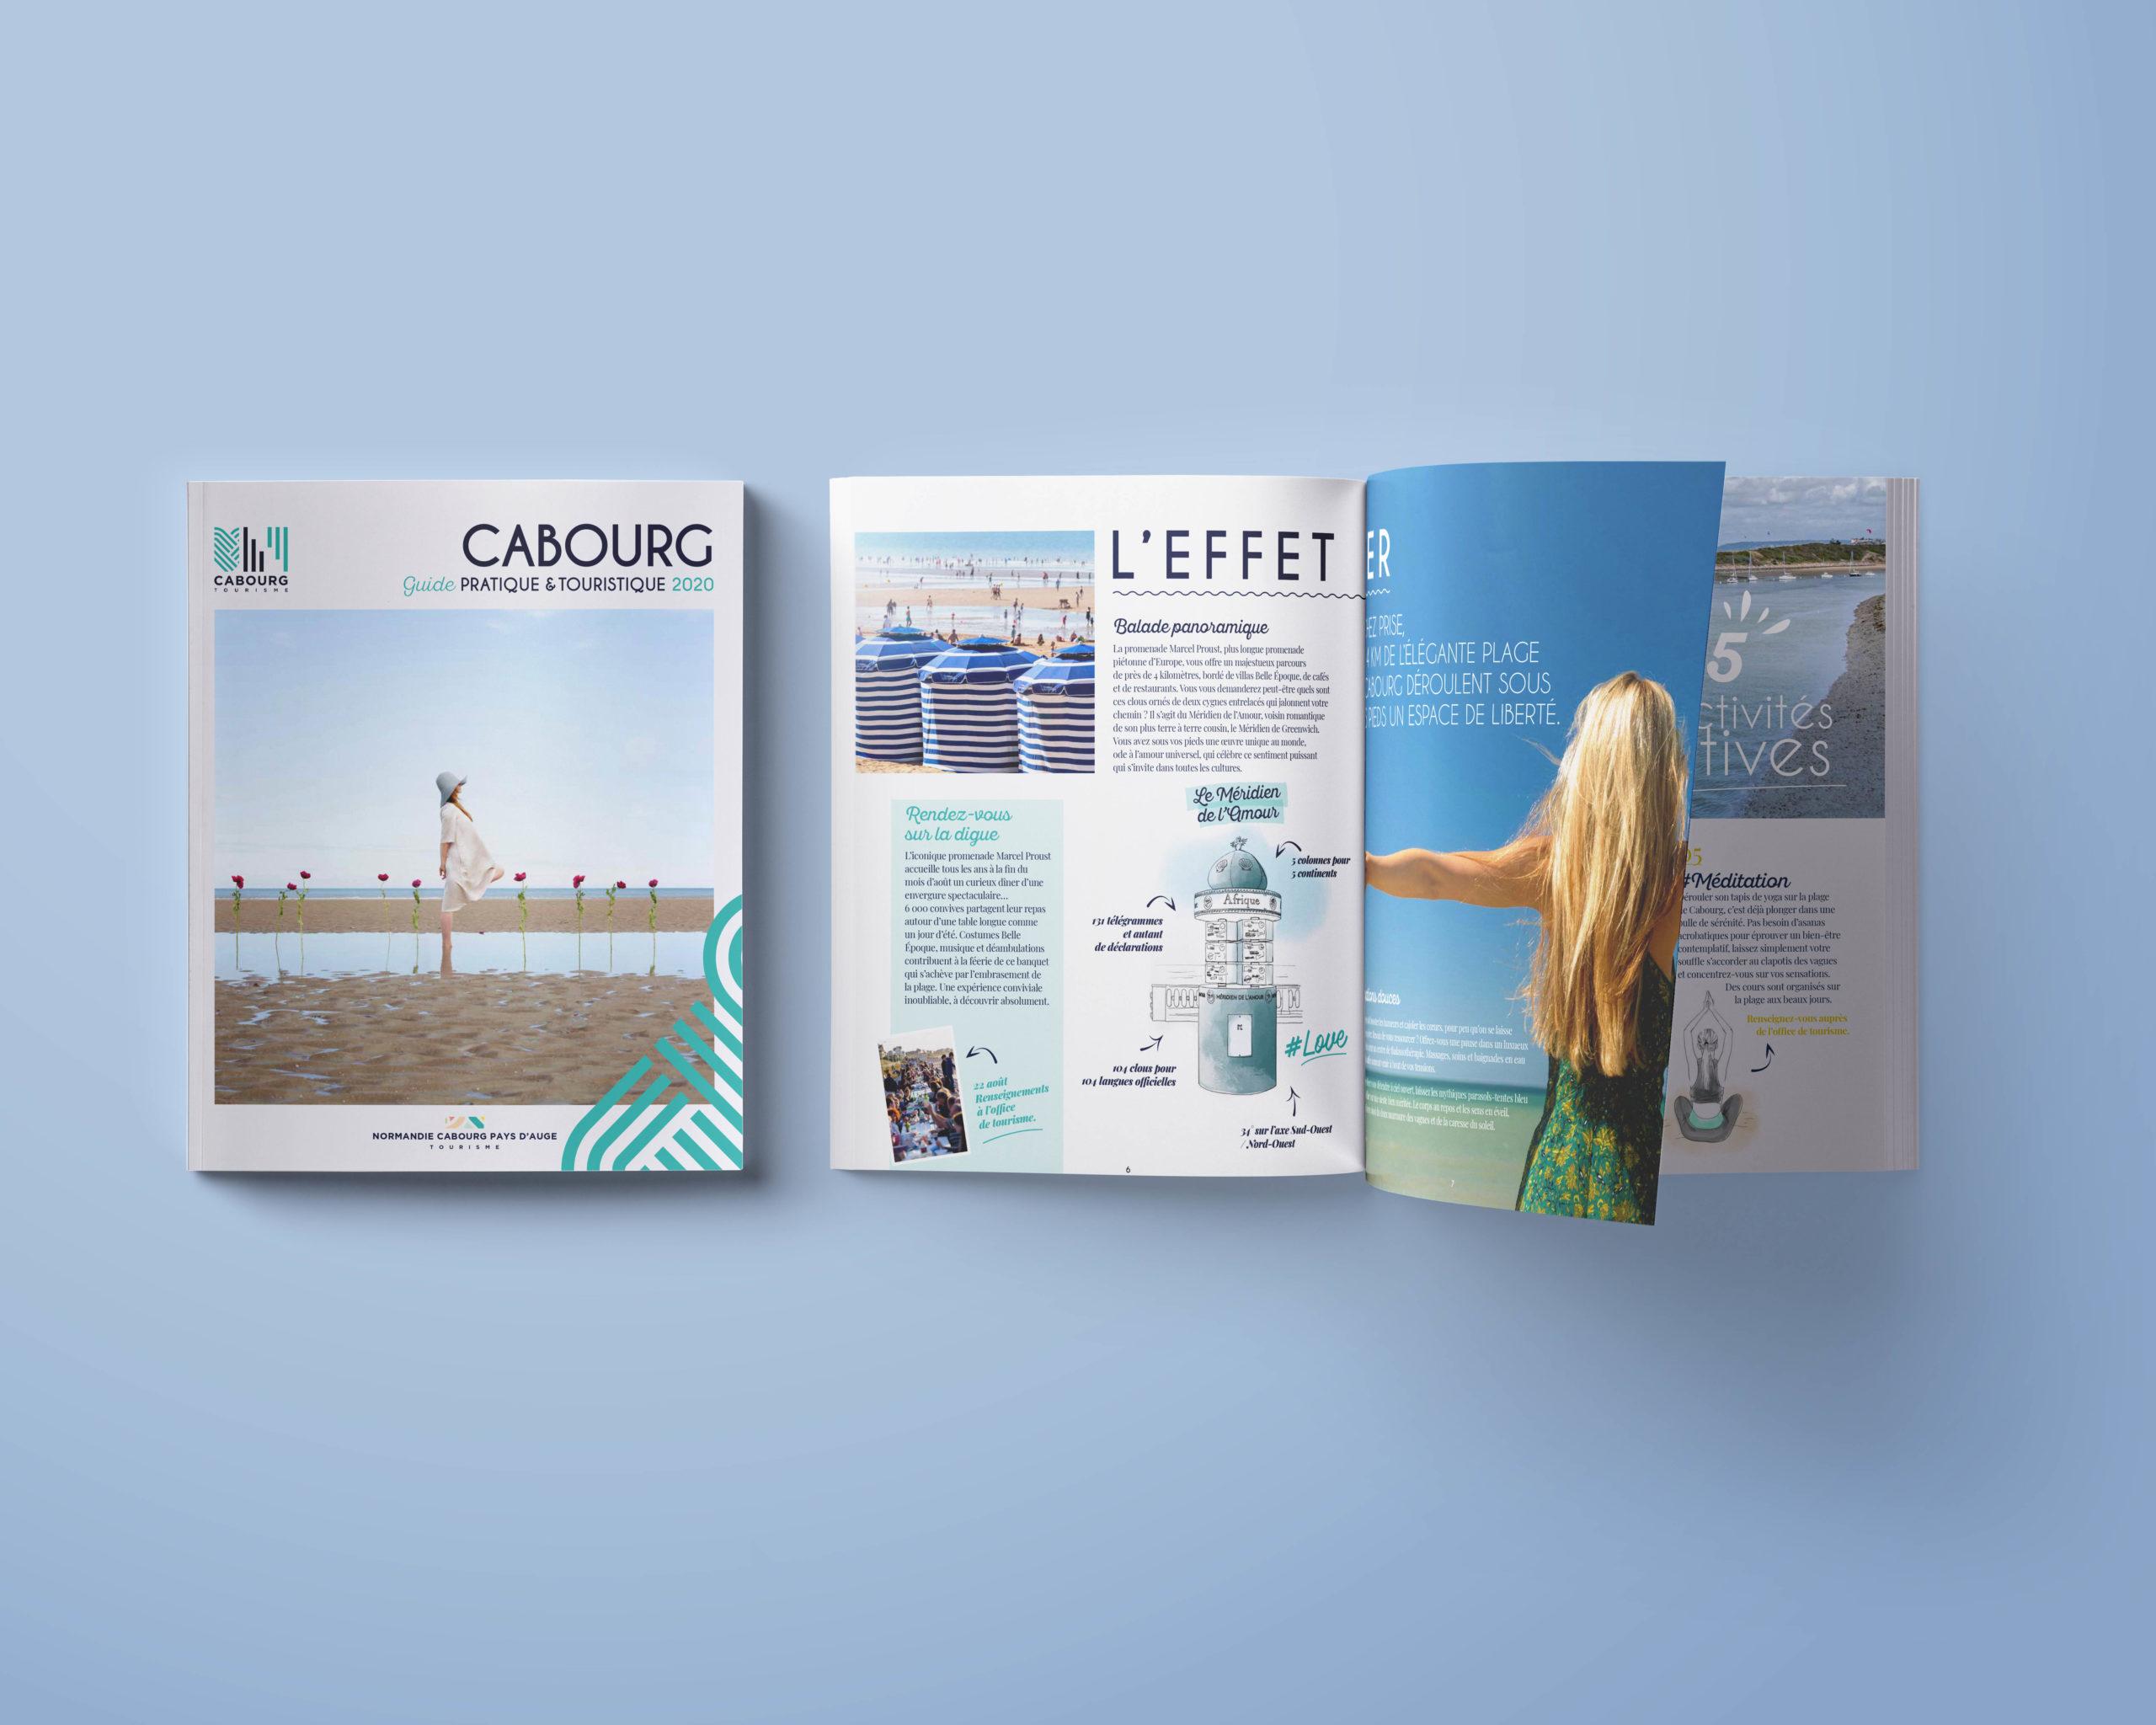 Guide touristique Cabourg